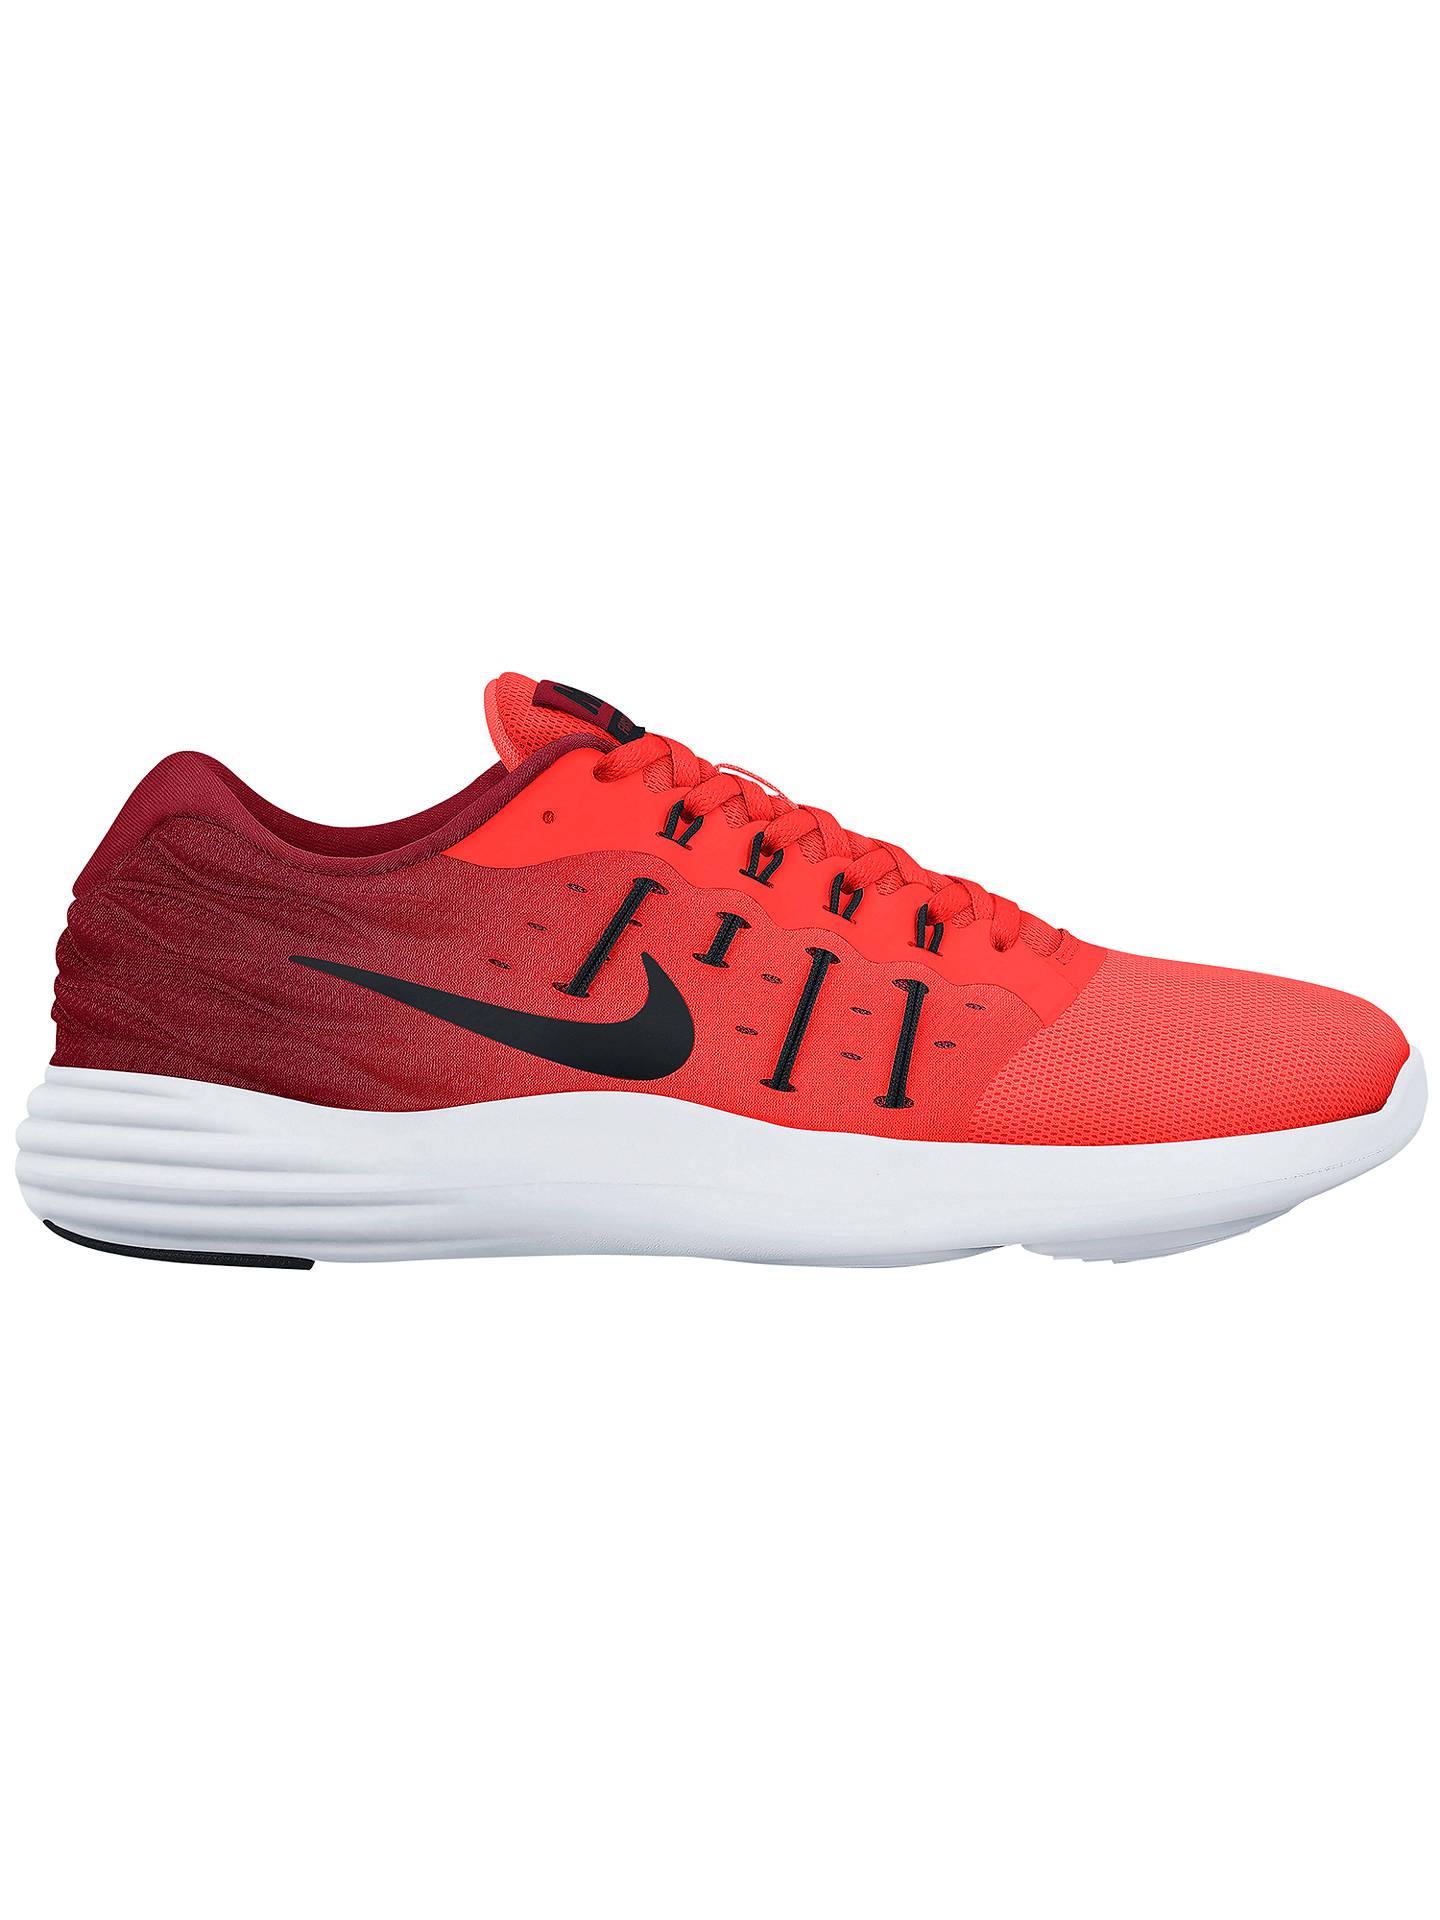 cheap for discount e4fb1 e20f3 Buy Nike LunarStelos Women s Running Shoes, Total Crimson Black, 5 Online  at johnlewis ...